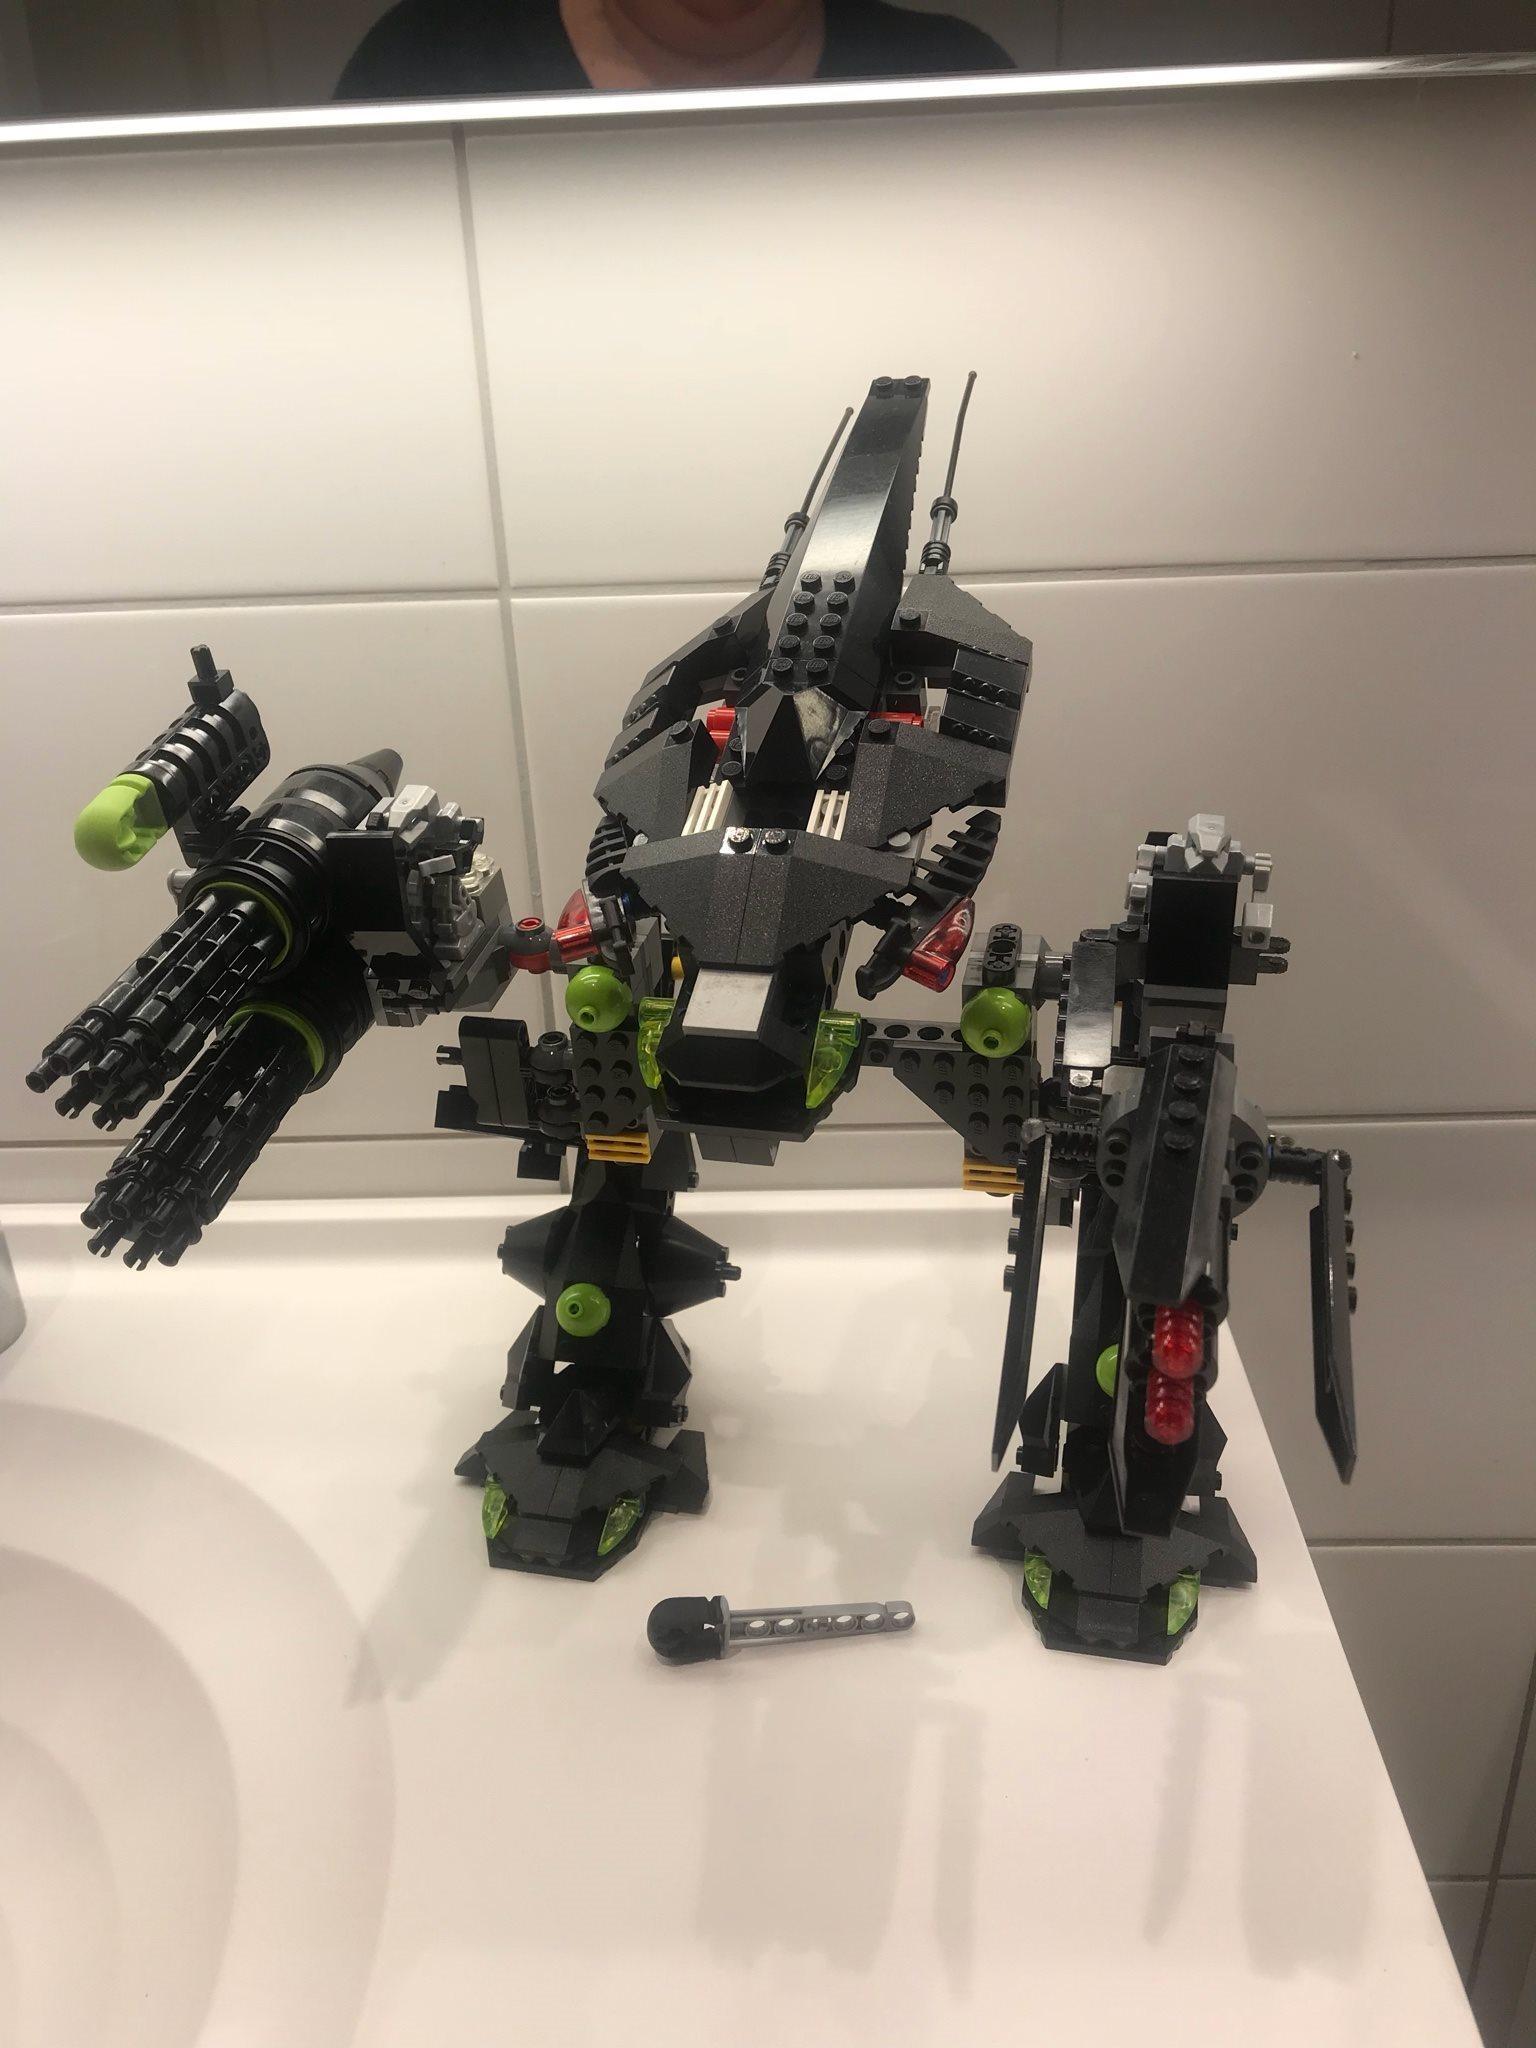 Lego Exoforce robot